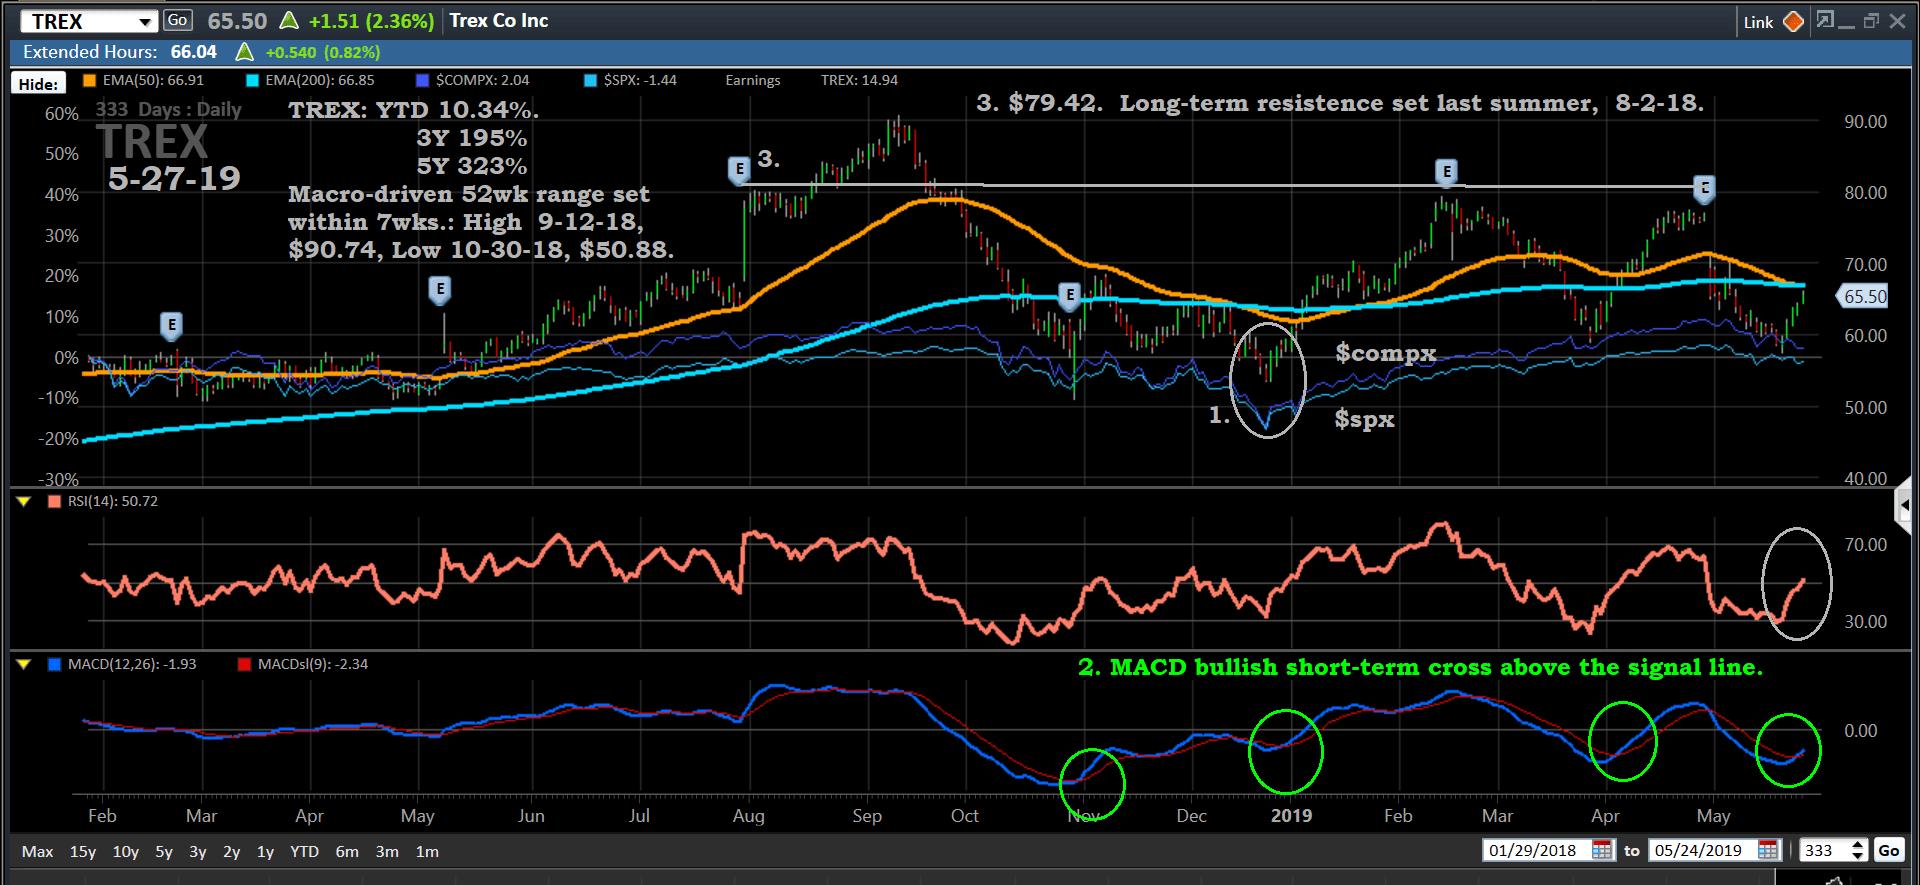 Chart, TREX, 5-27-19